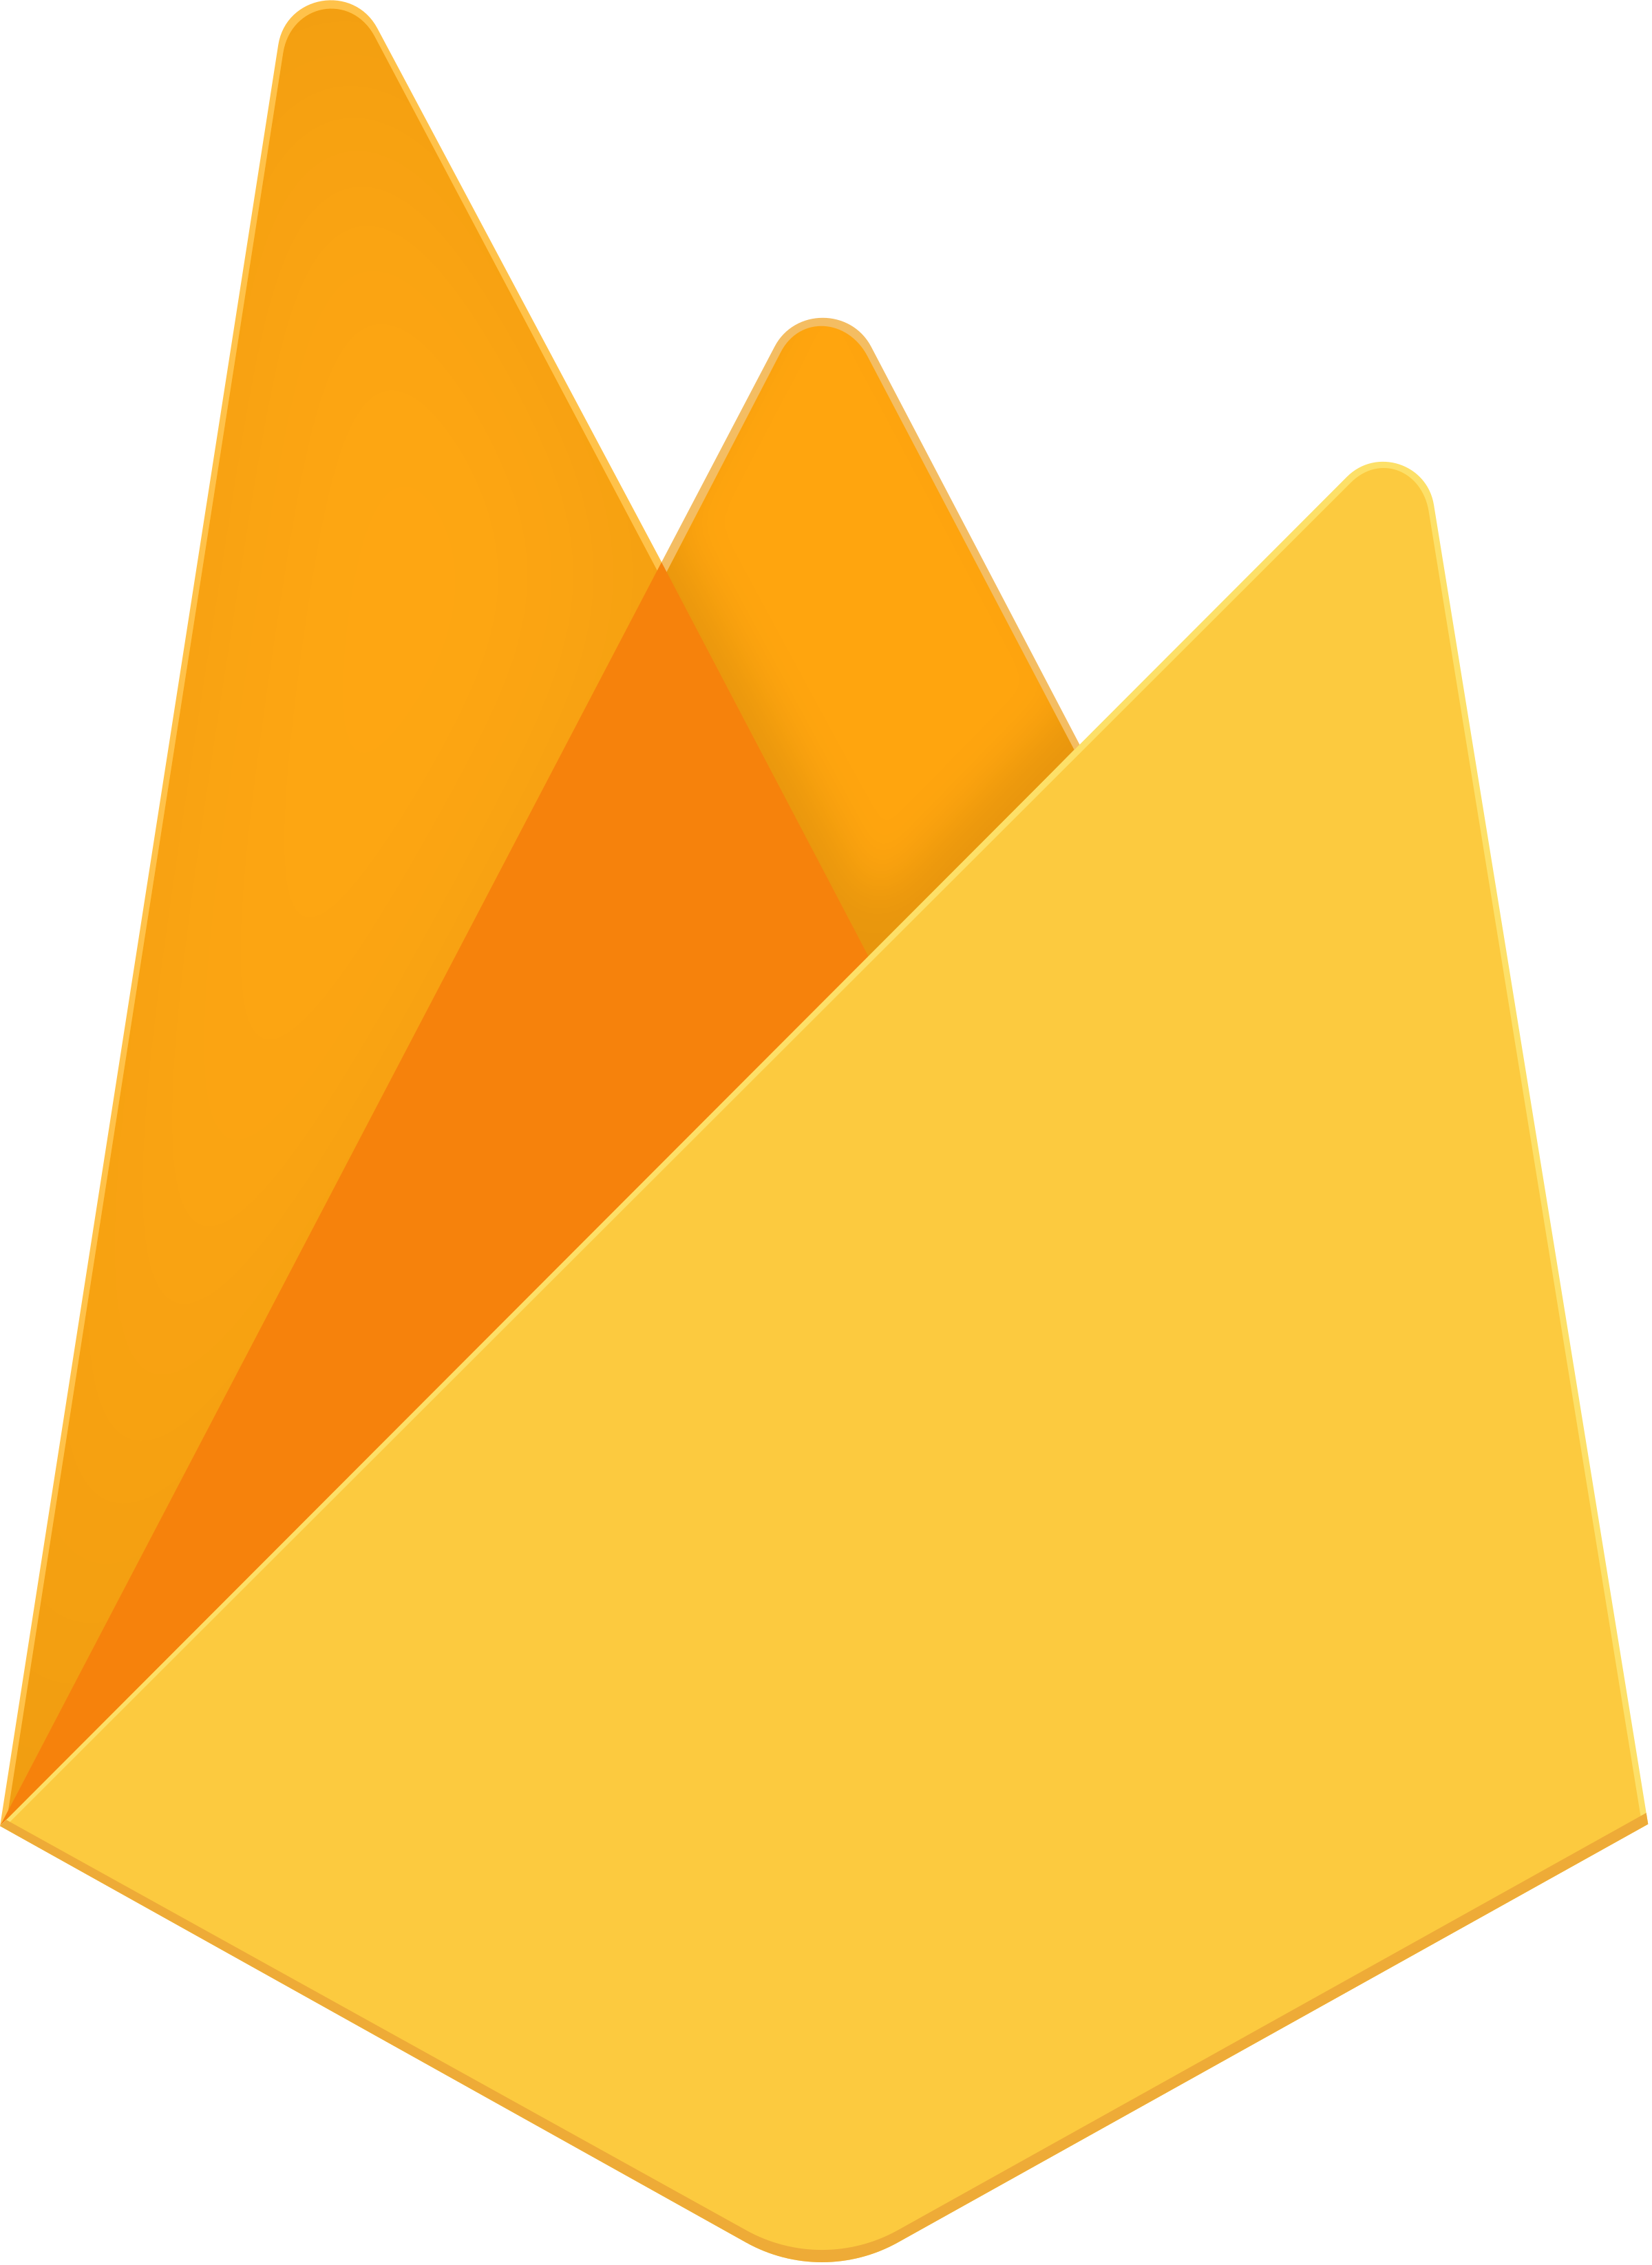 Firebase Logo PNG Transparent & SVG Vector.